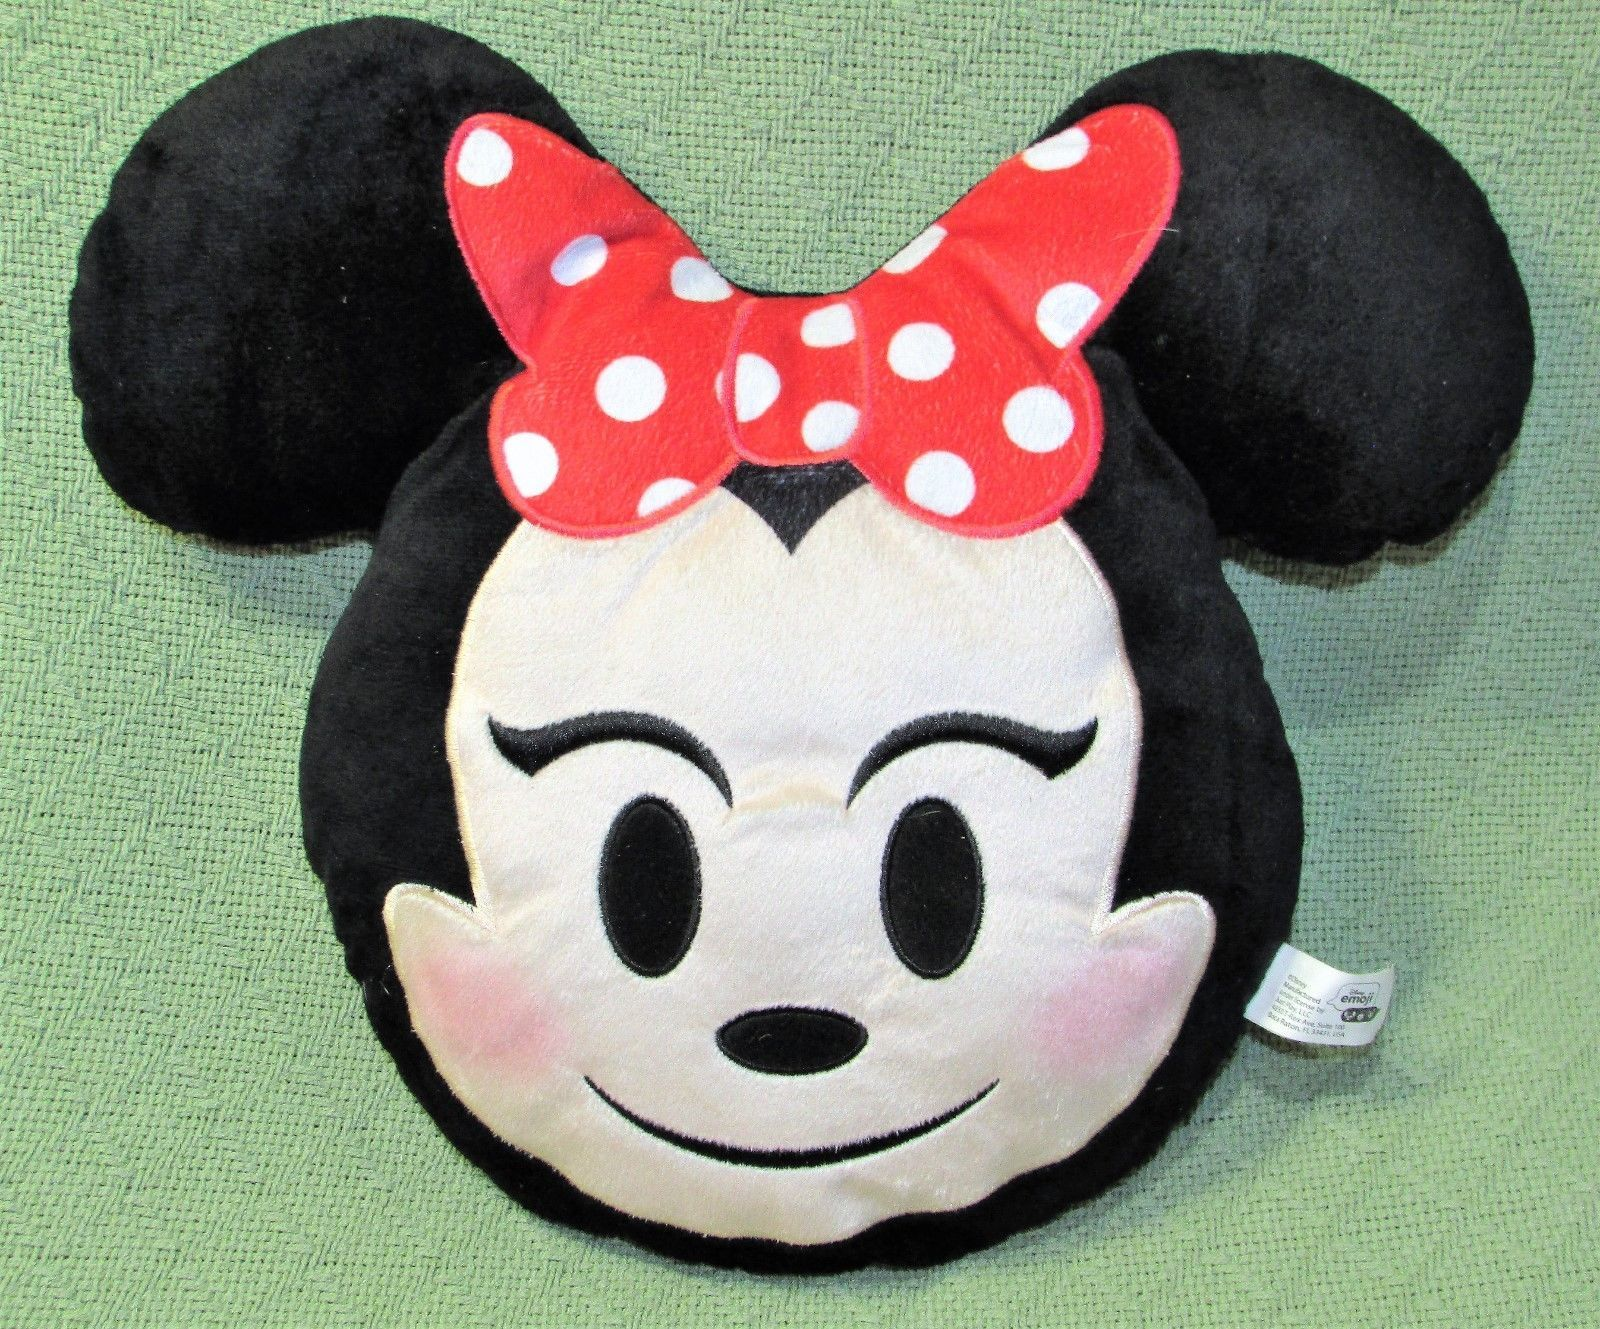 "Disney Minnie Mouse EMOJI PILLOW Plush Stuffed Character 11"" Red Bow Polka Dot  image 2"